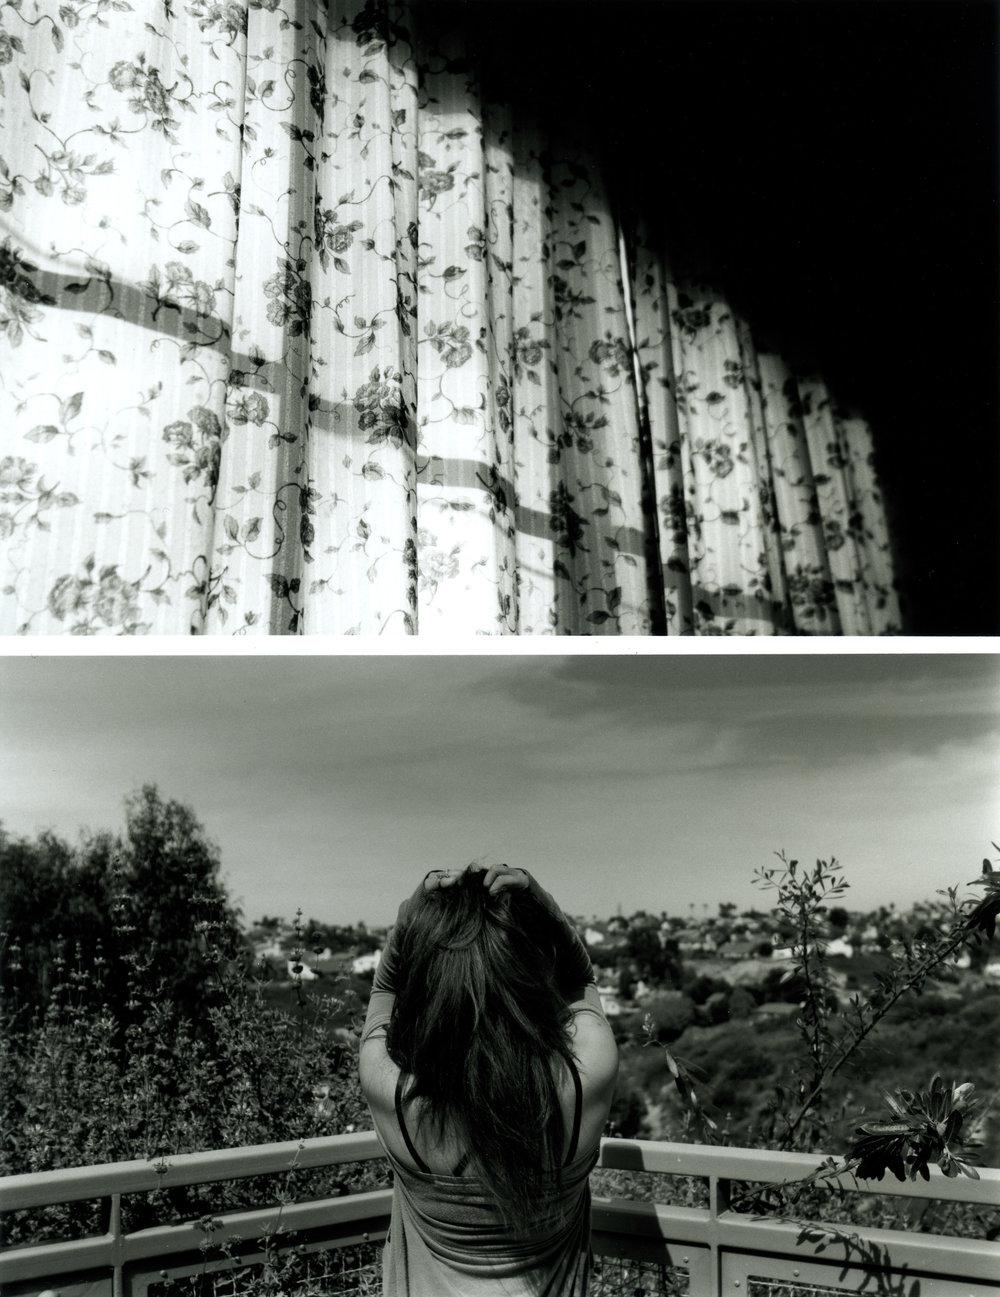 ANAI ORTIZ, MIRACOSTA COLLEGE, GELATIN SILVER PRINT, 2014